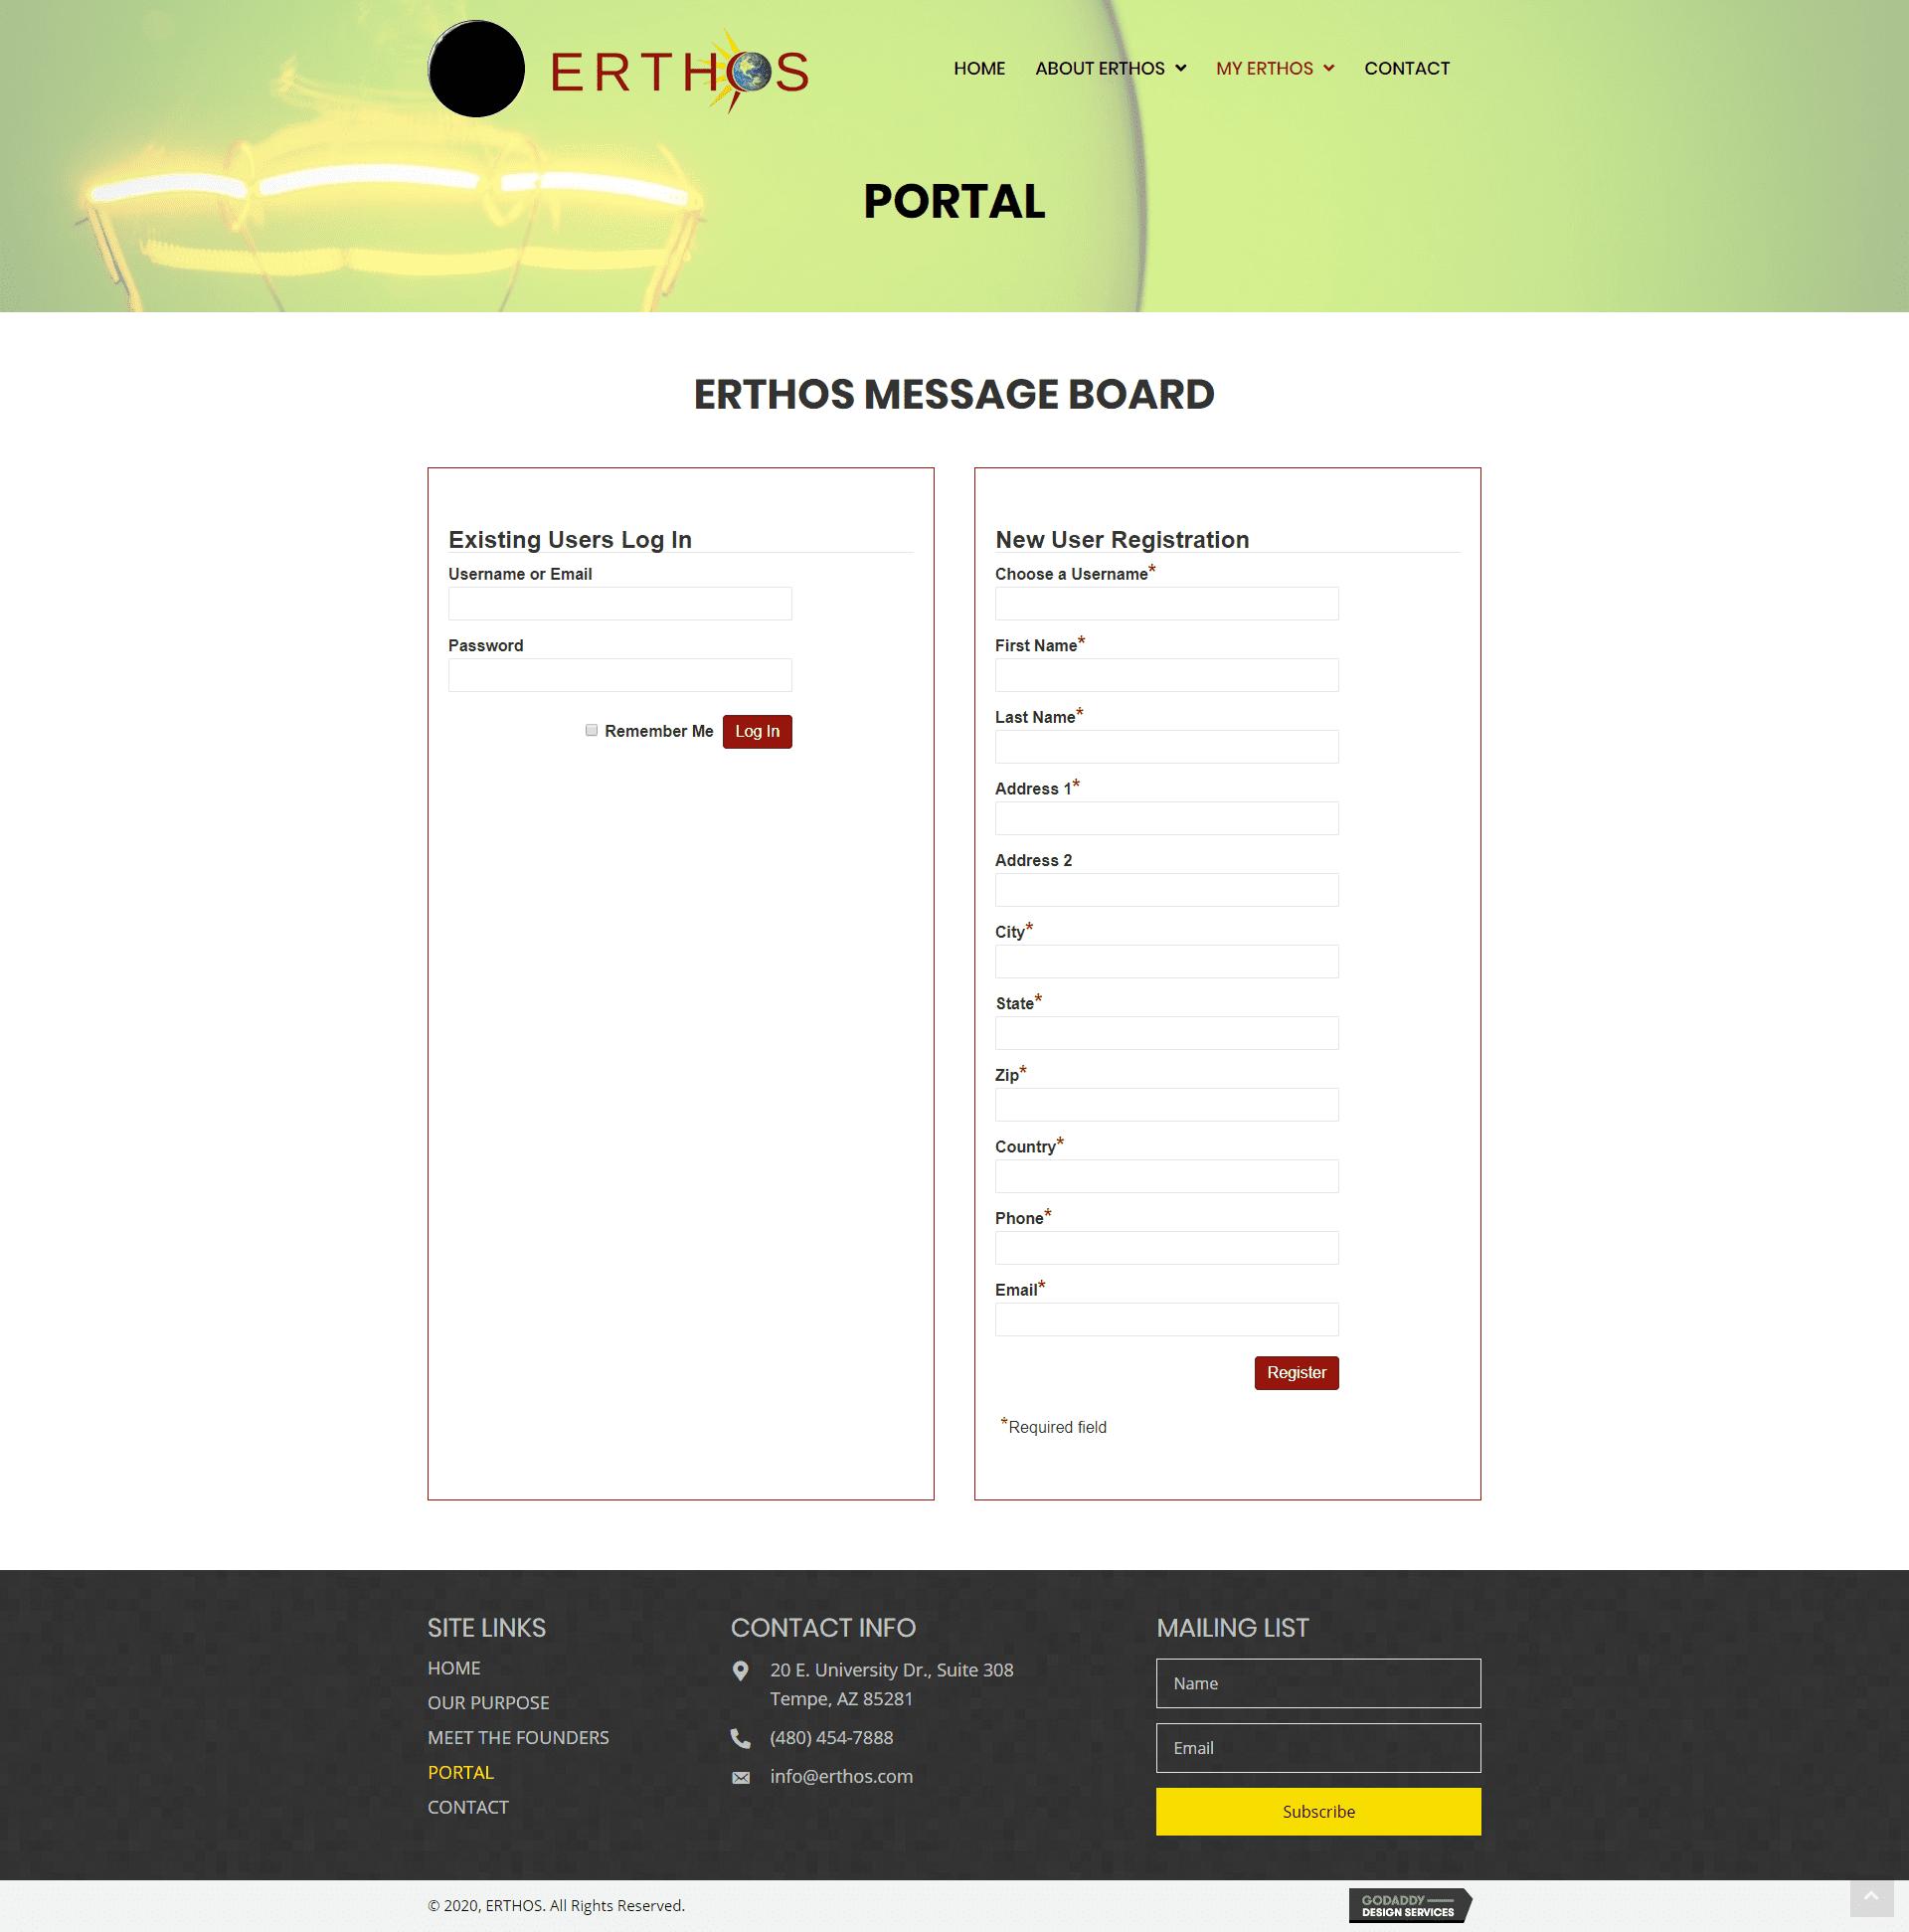 screencapture-hj0-e43-myftpupload-portal